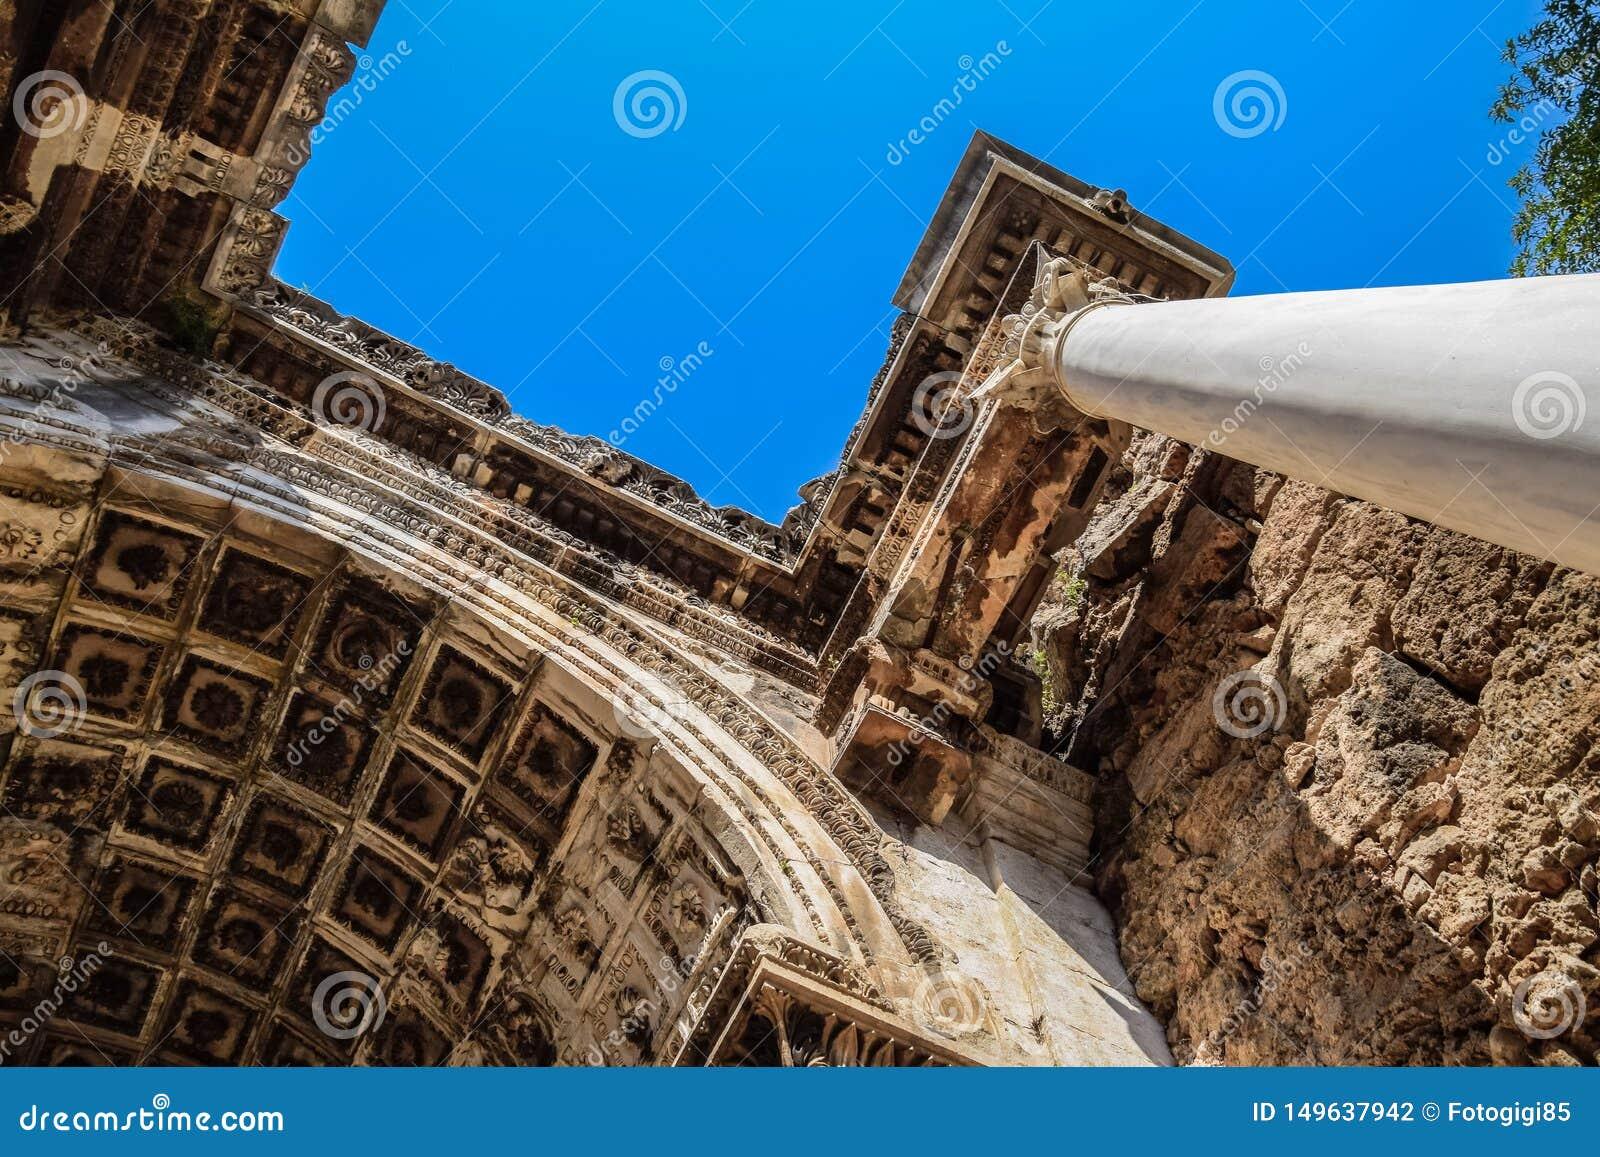 Ворота Адриана, ориентир Антальи, Турция Античная конструкция мраморного и